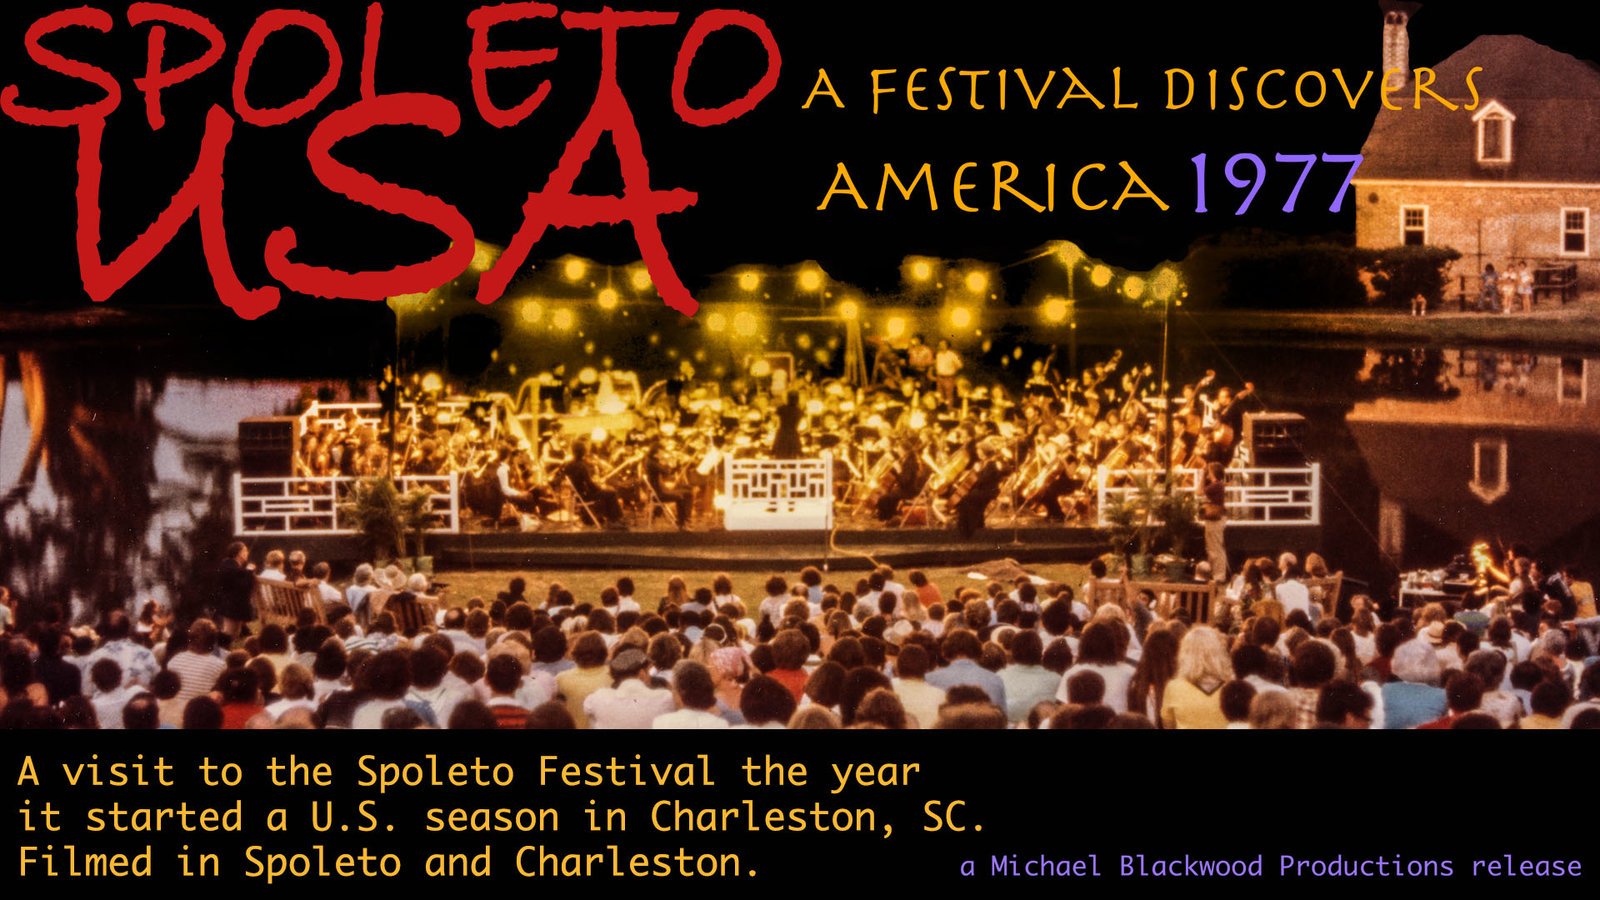 Spoleto USA: A Festival Discovers America - A Performing Arts Festival in South Carolina